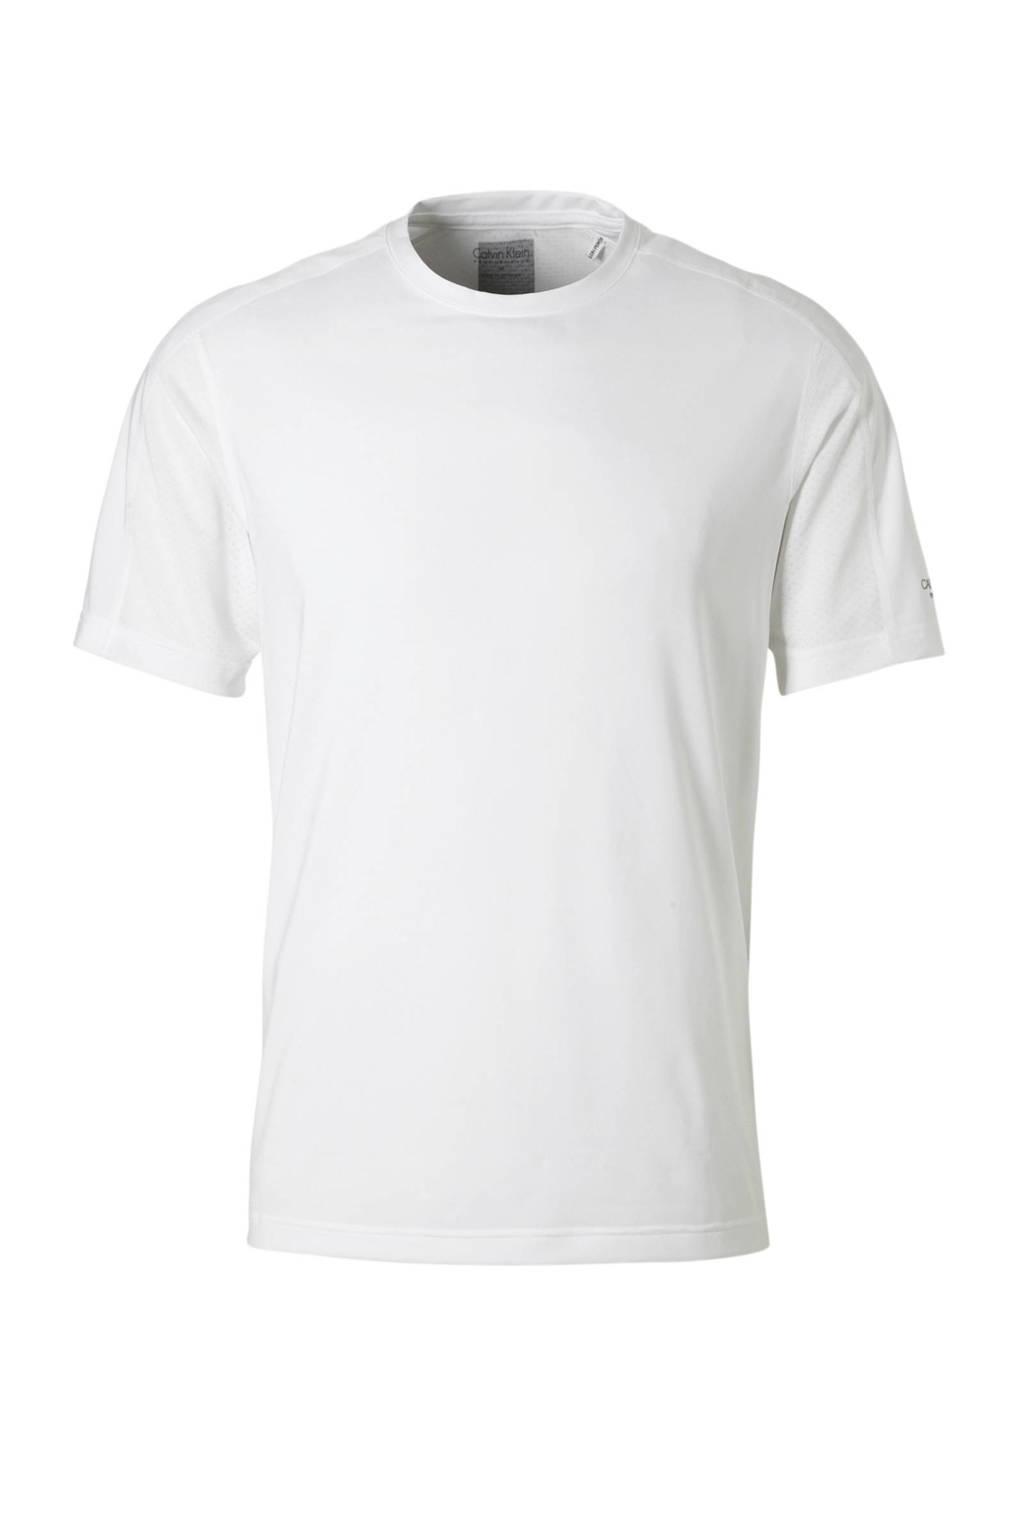 Calvin Klein Performance   T-shirt wit, Wit